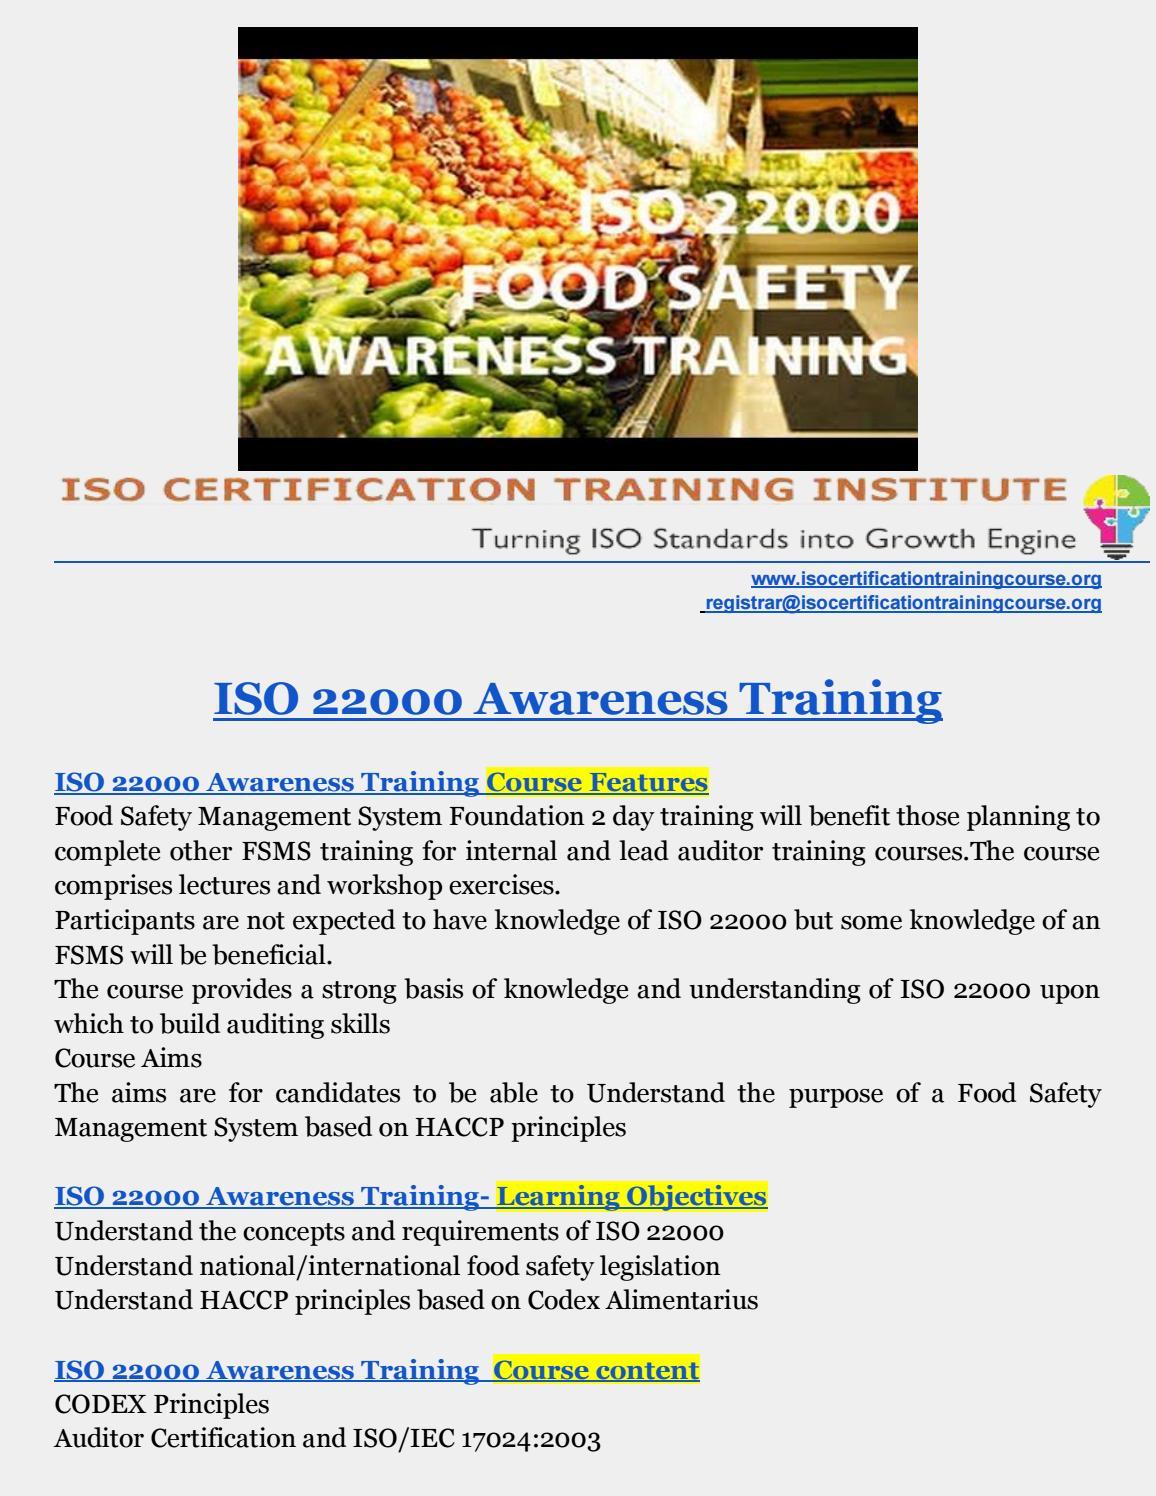 ISO 22000 training | ISO 22000 Awareness Training | FSSC